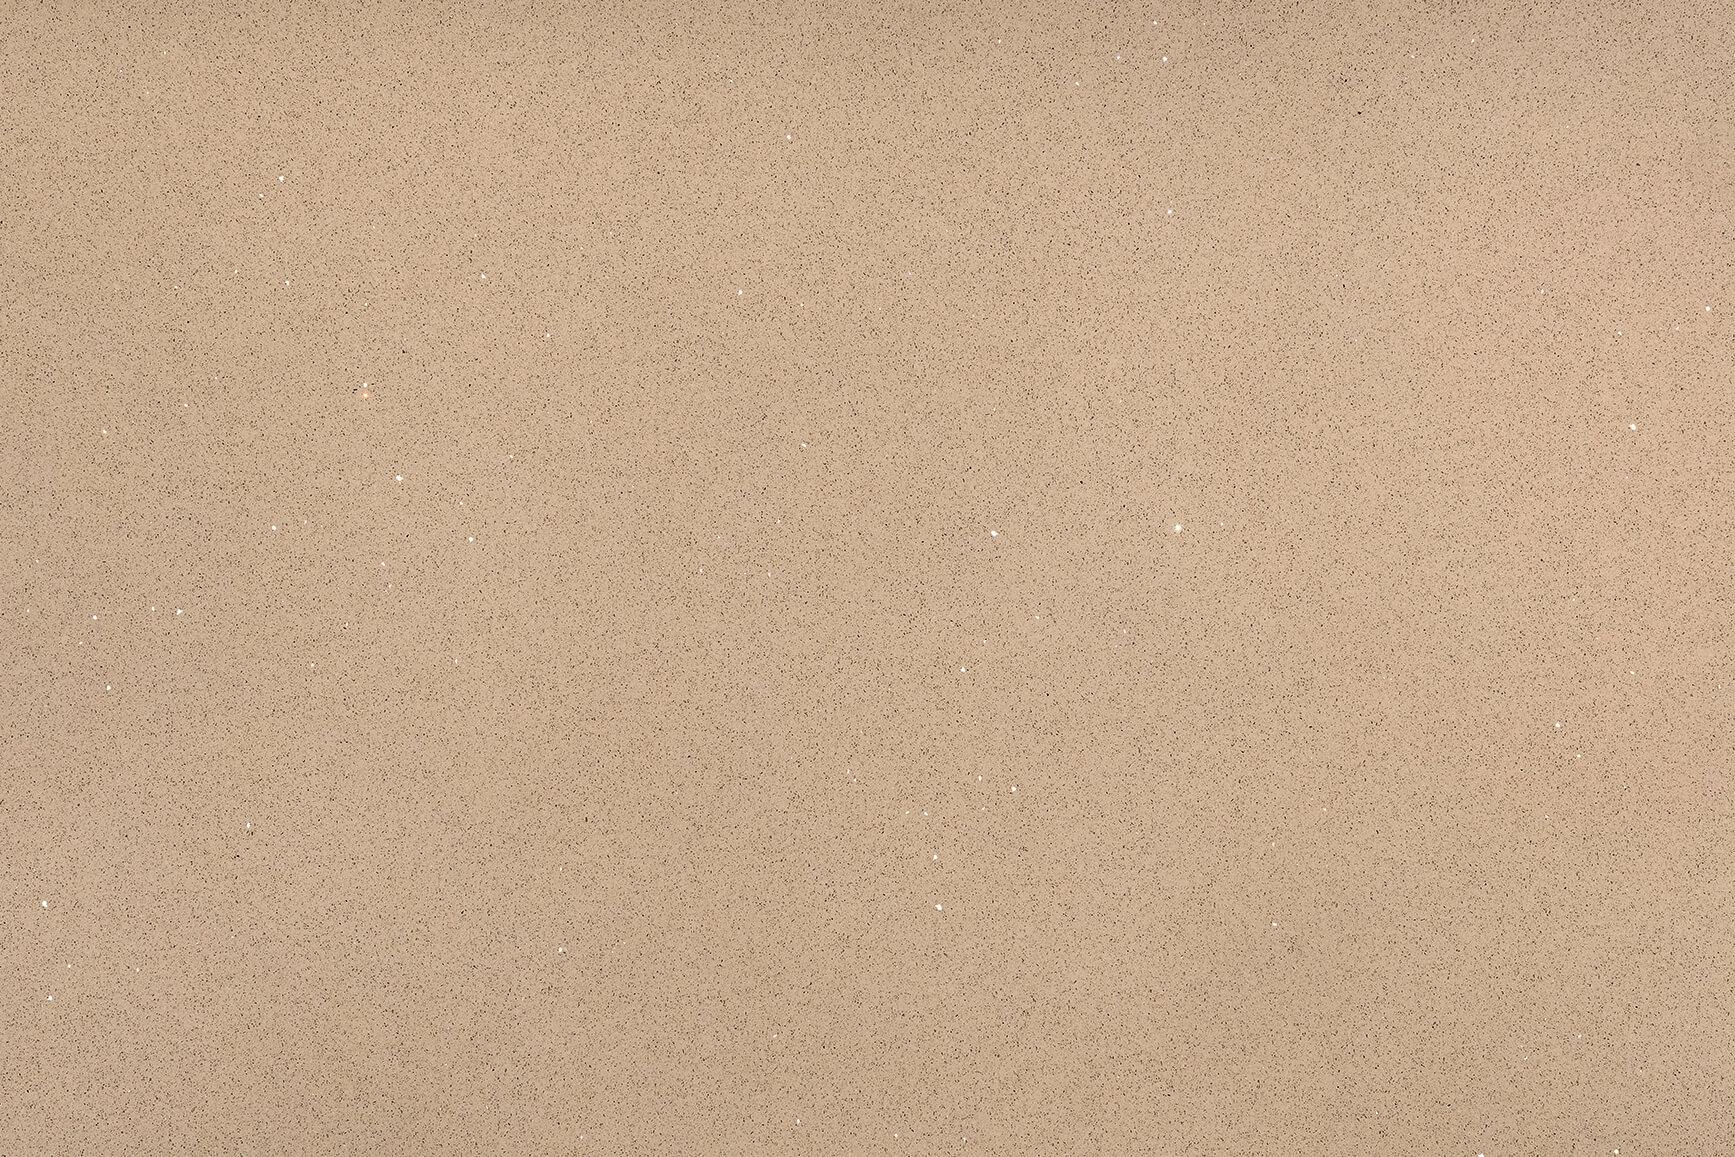 Starlight-Sand-P